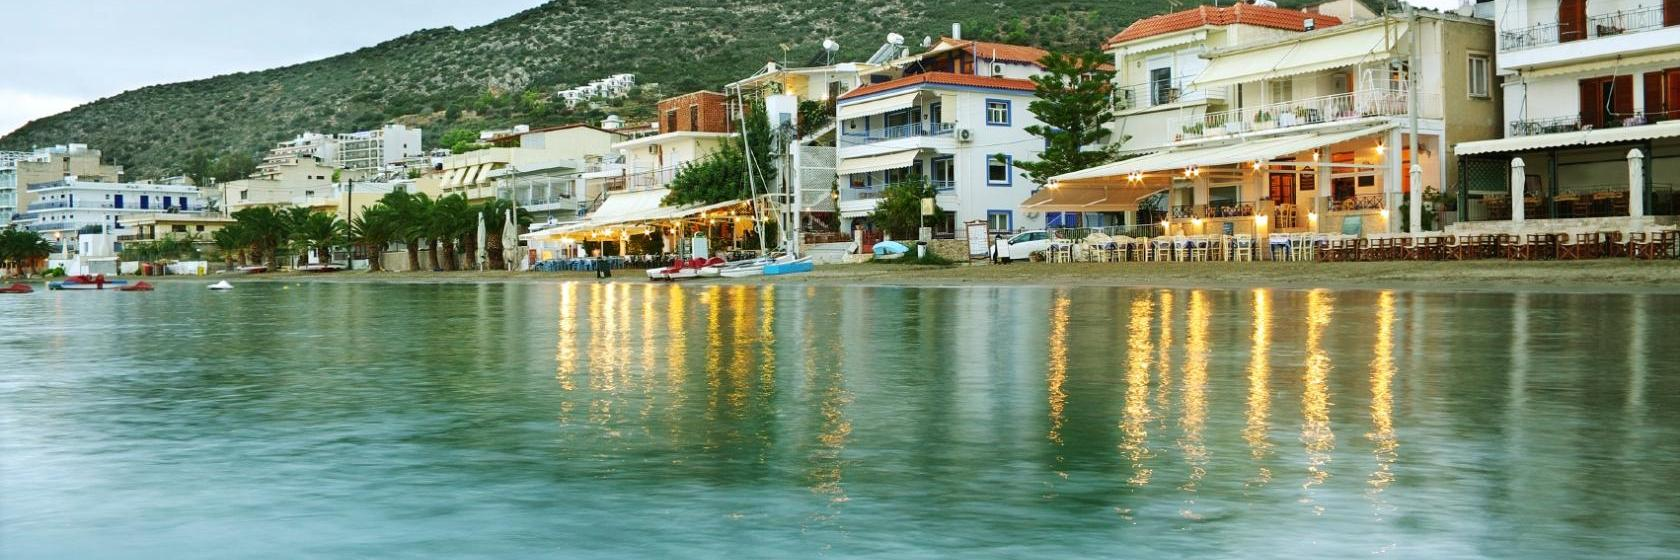 10 Best Tolo Hotels, Greece (From $44)